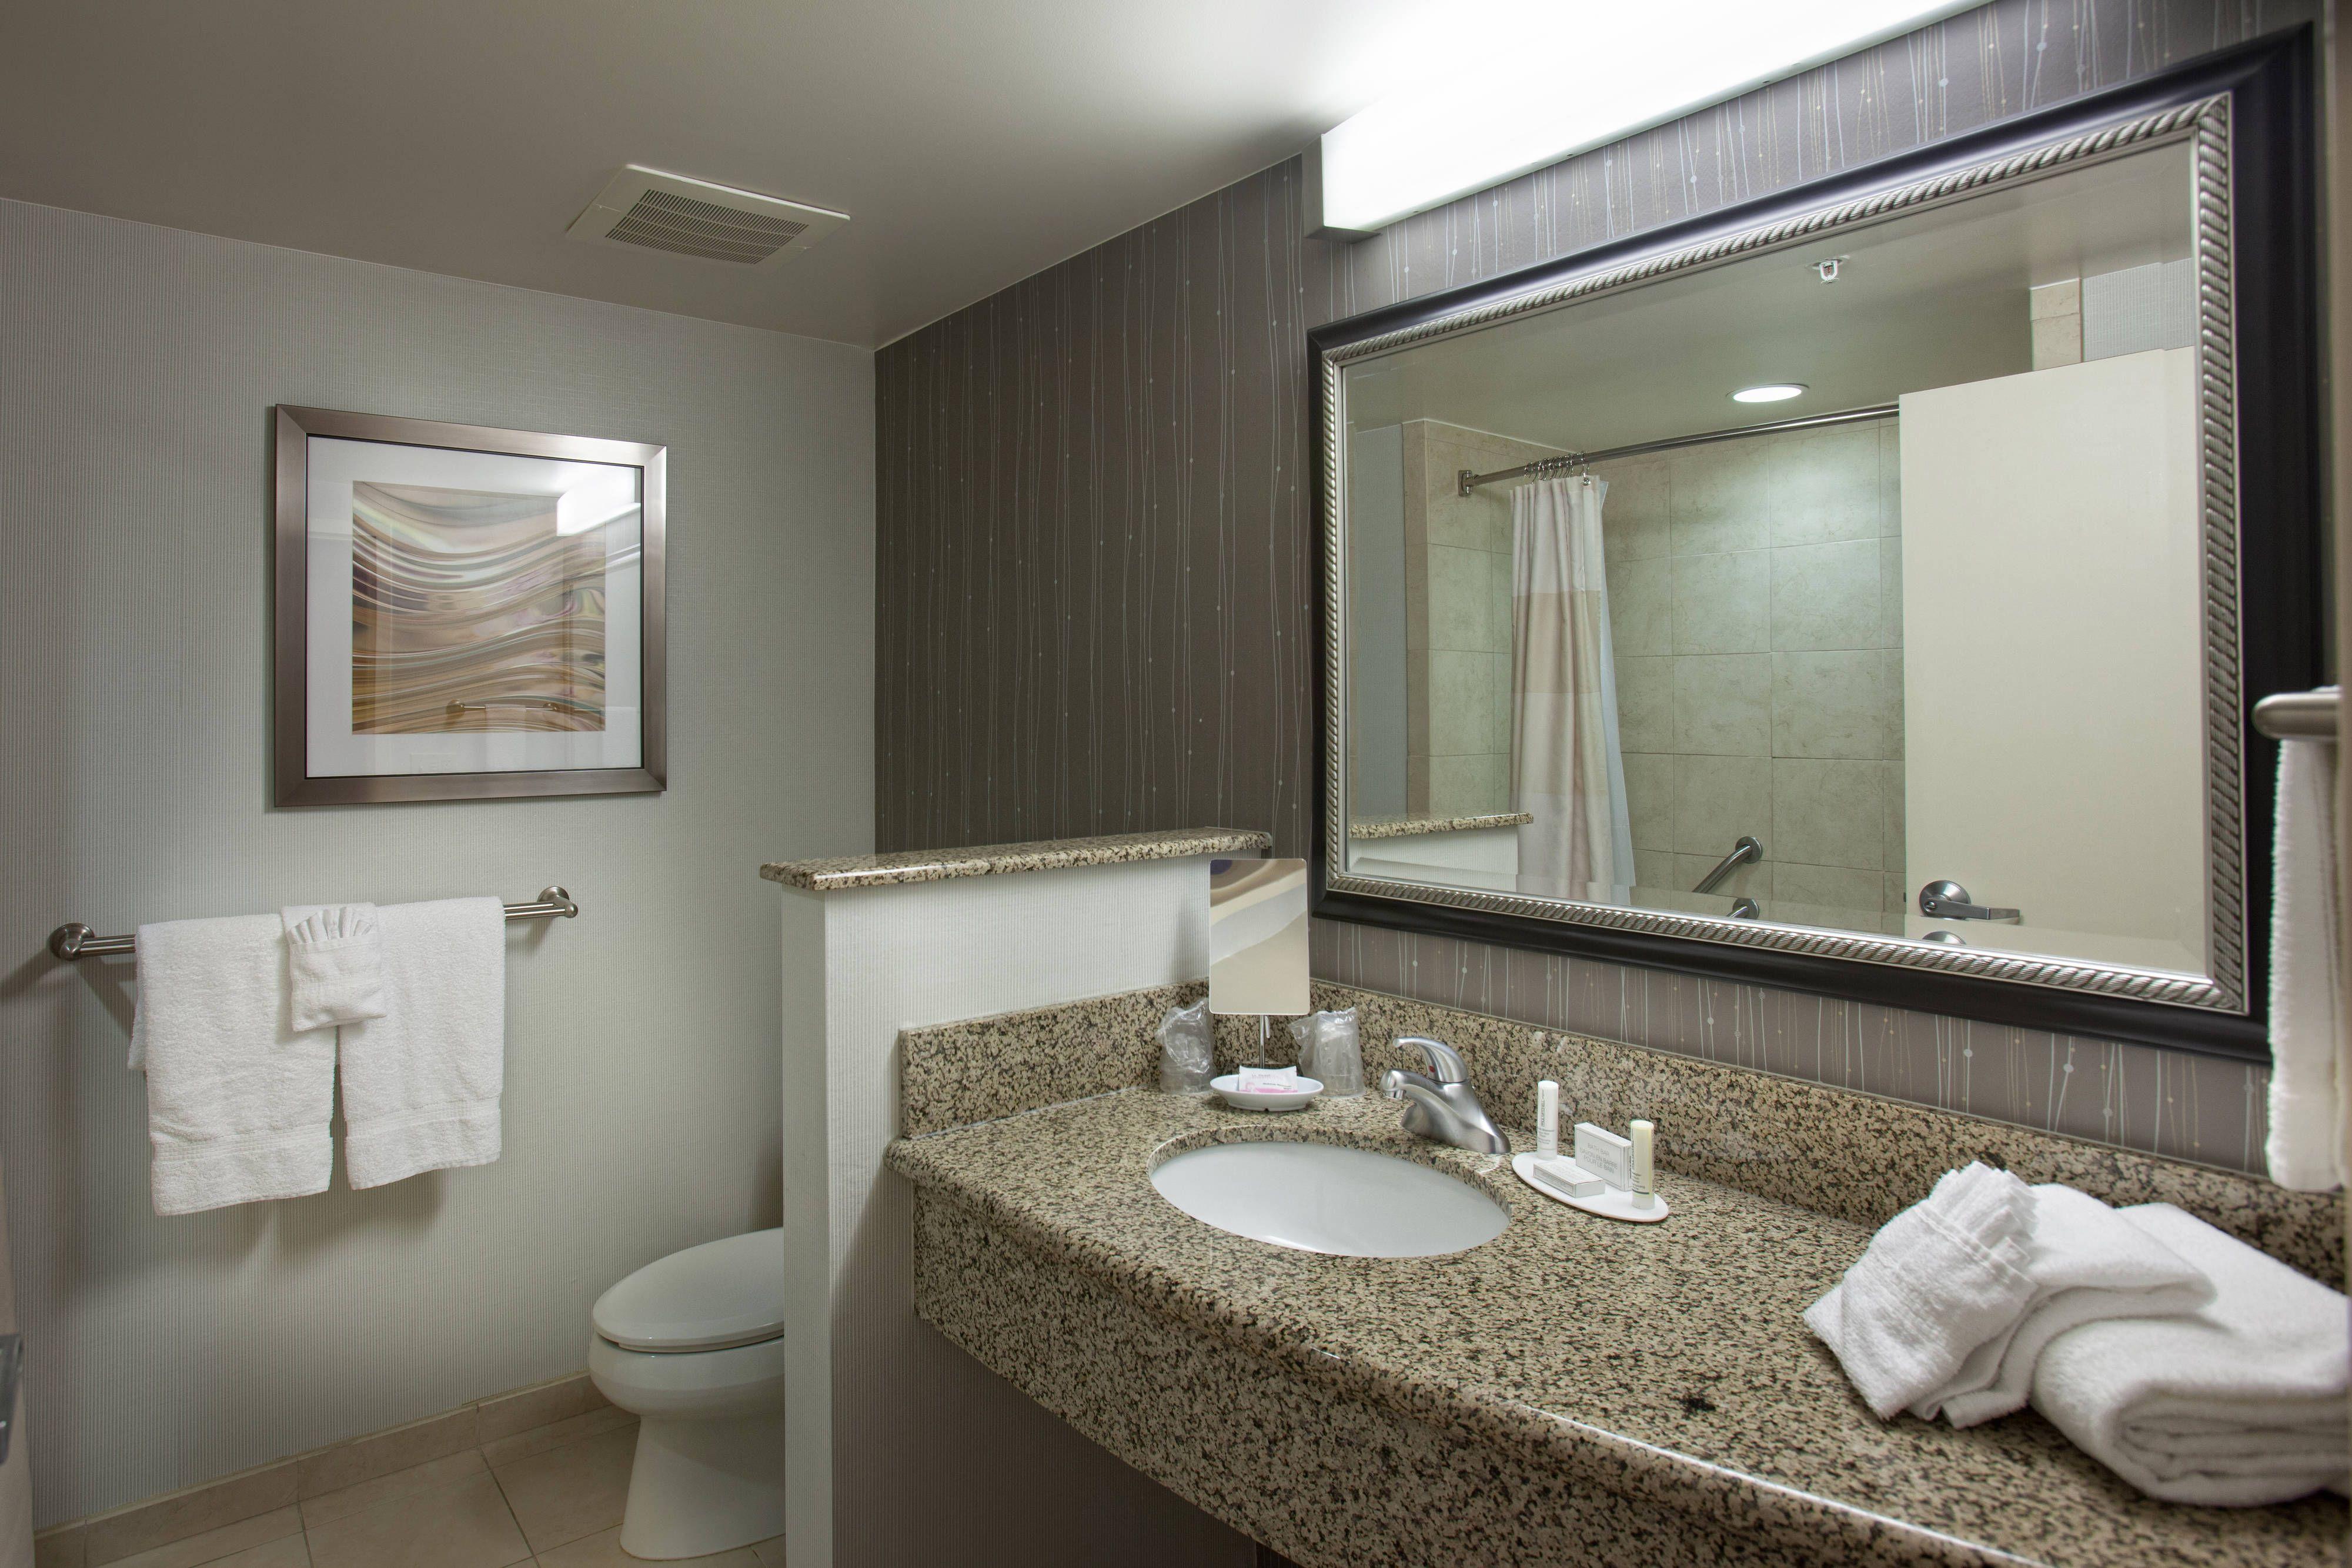 Courtyard Fayetteville Guest Bathroom Comfort Comfortable